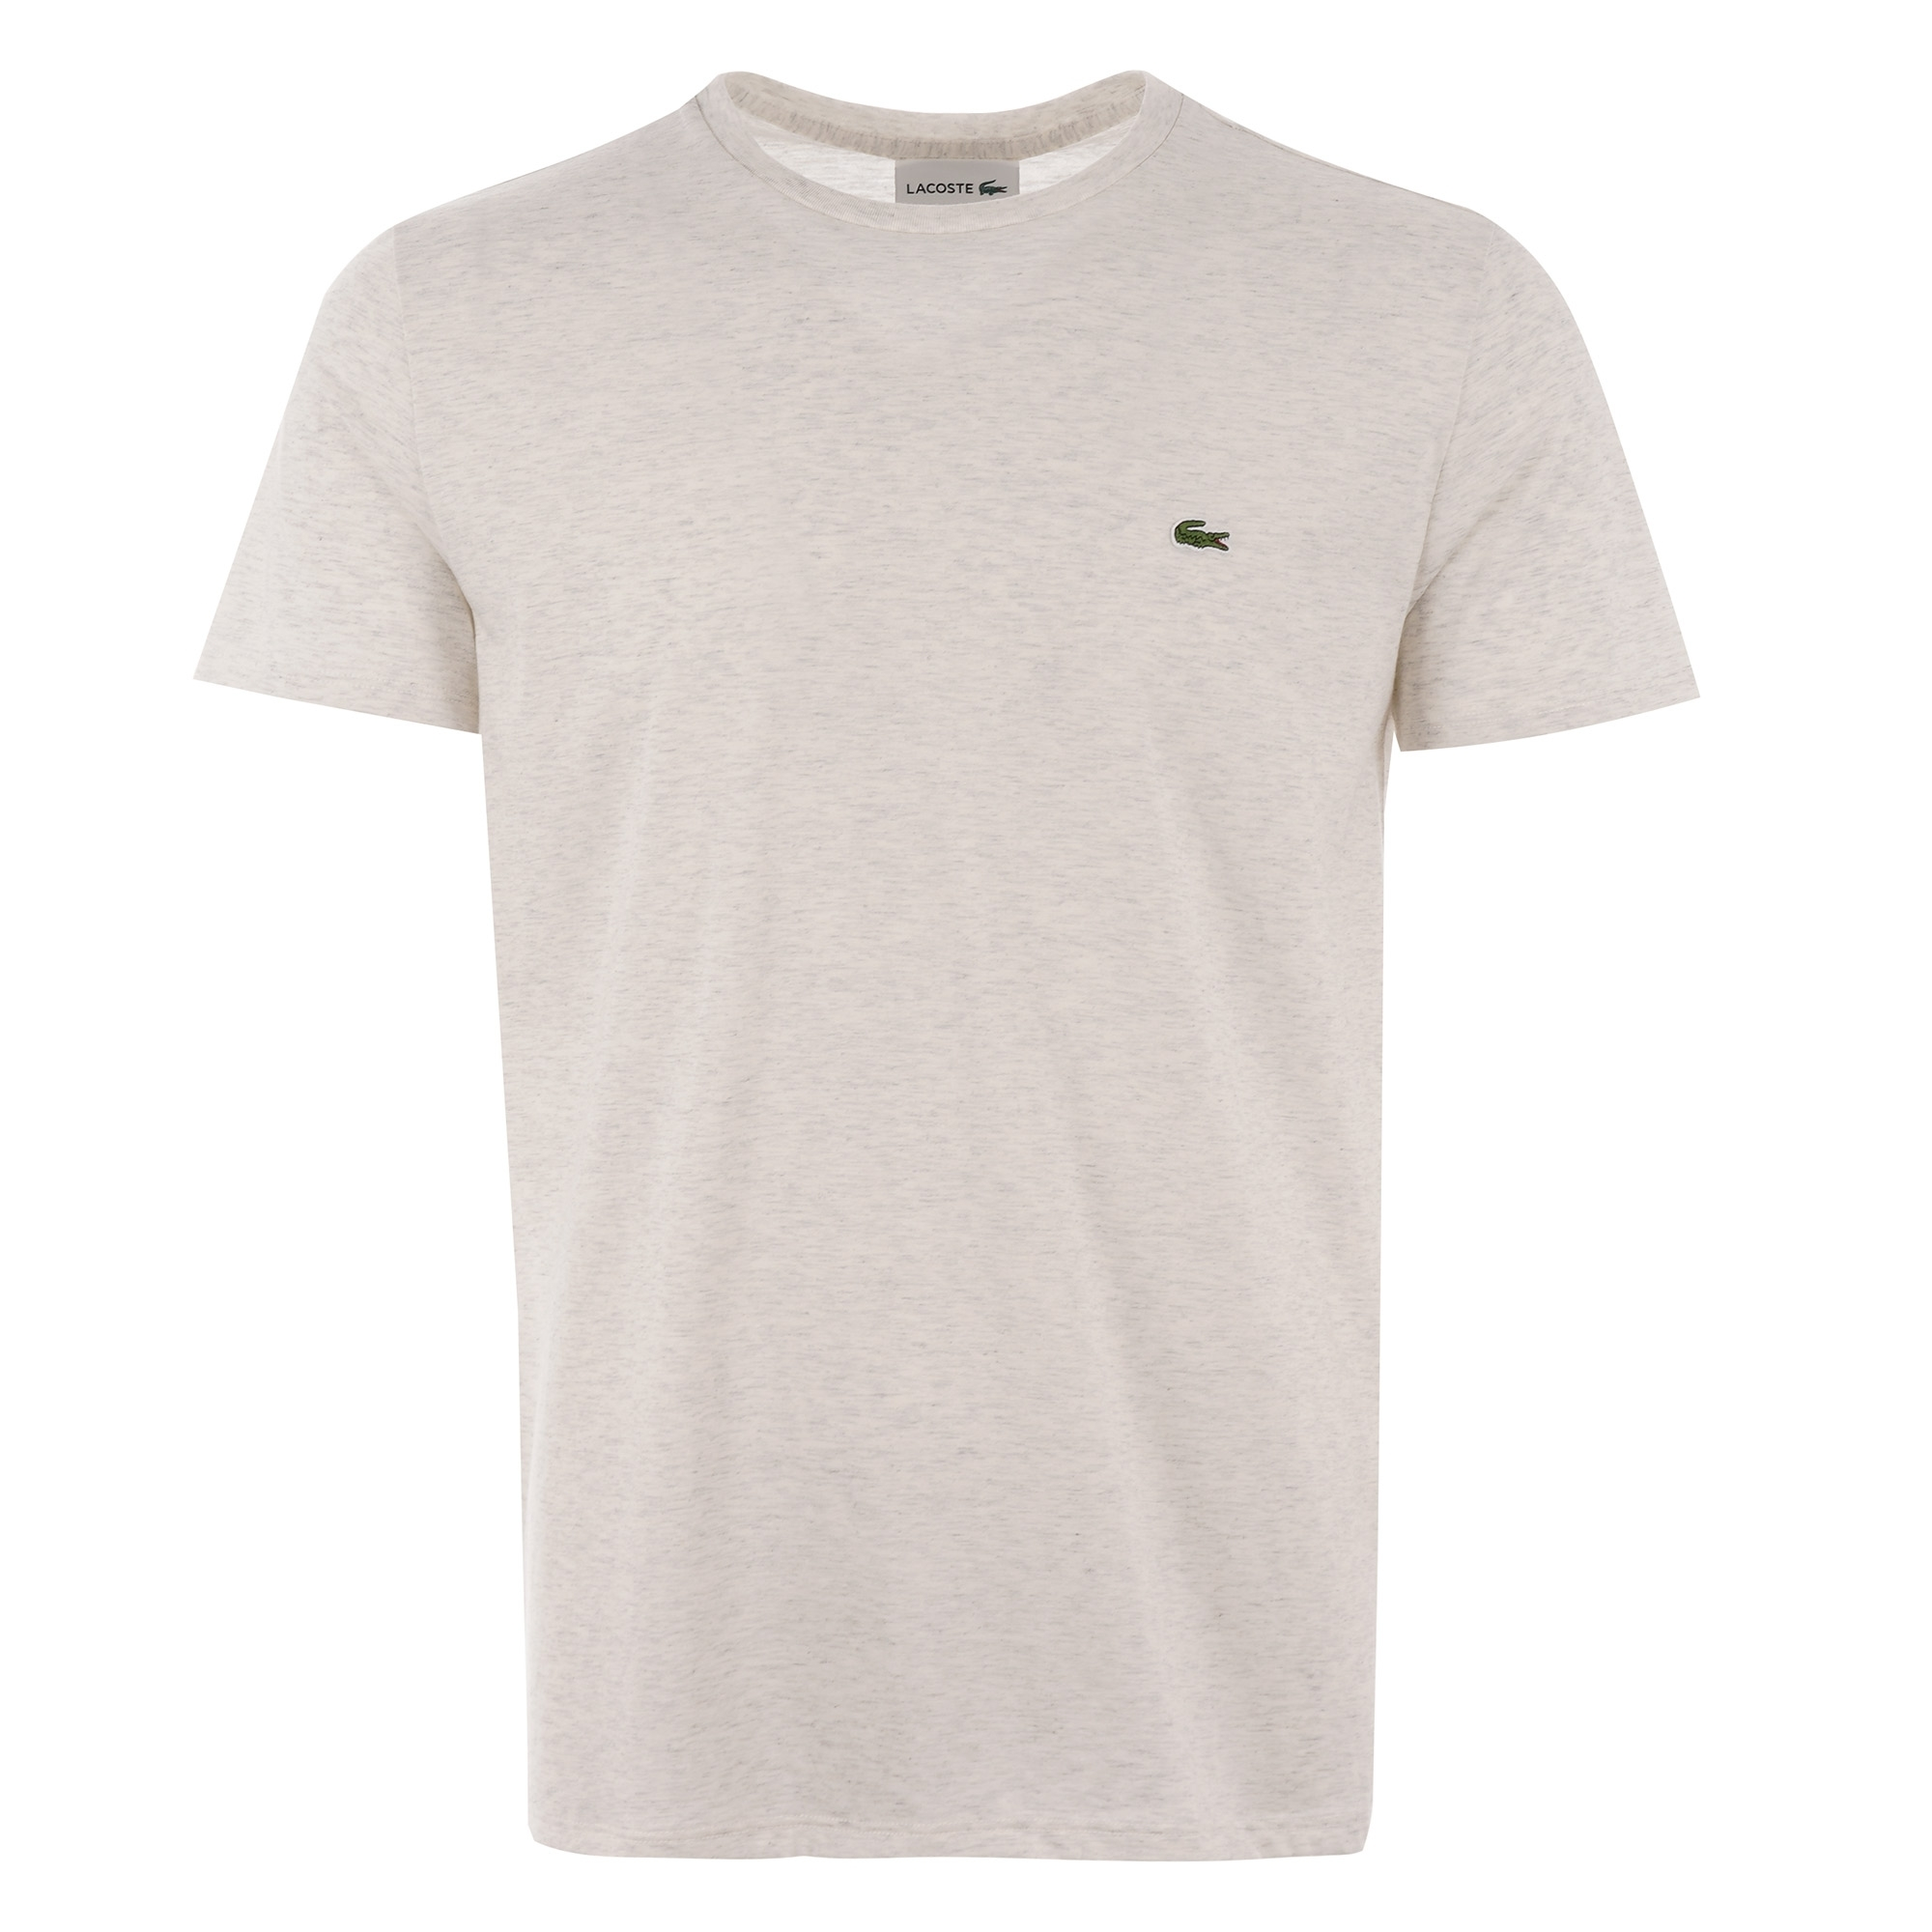 Lacoste Pima Cotton Jersey T-Shirt